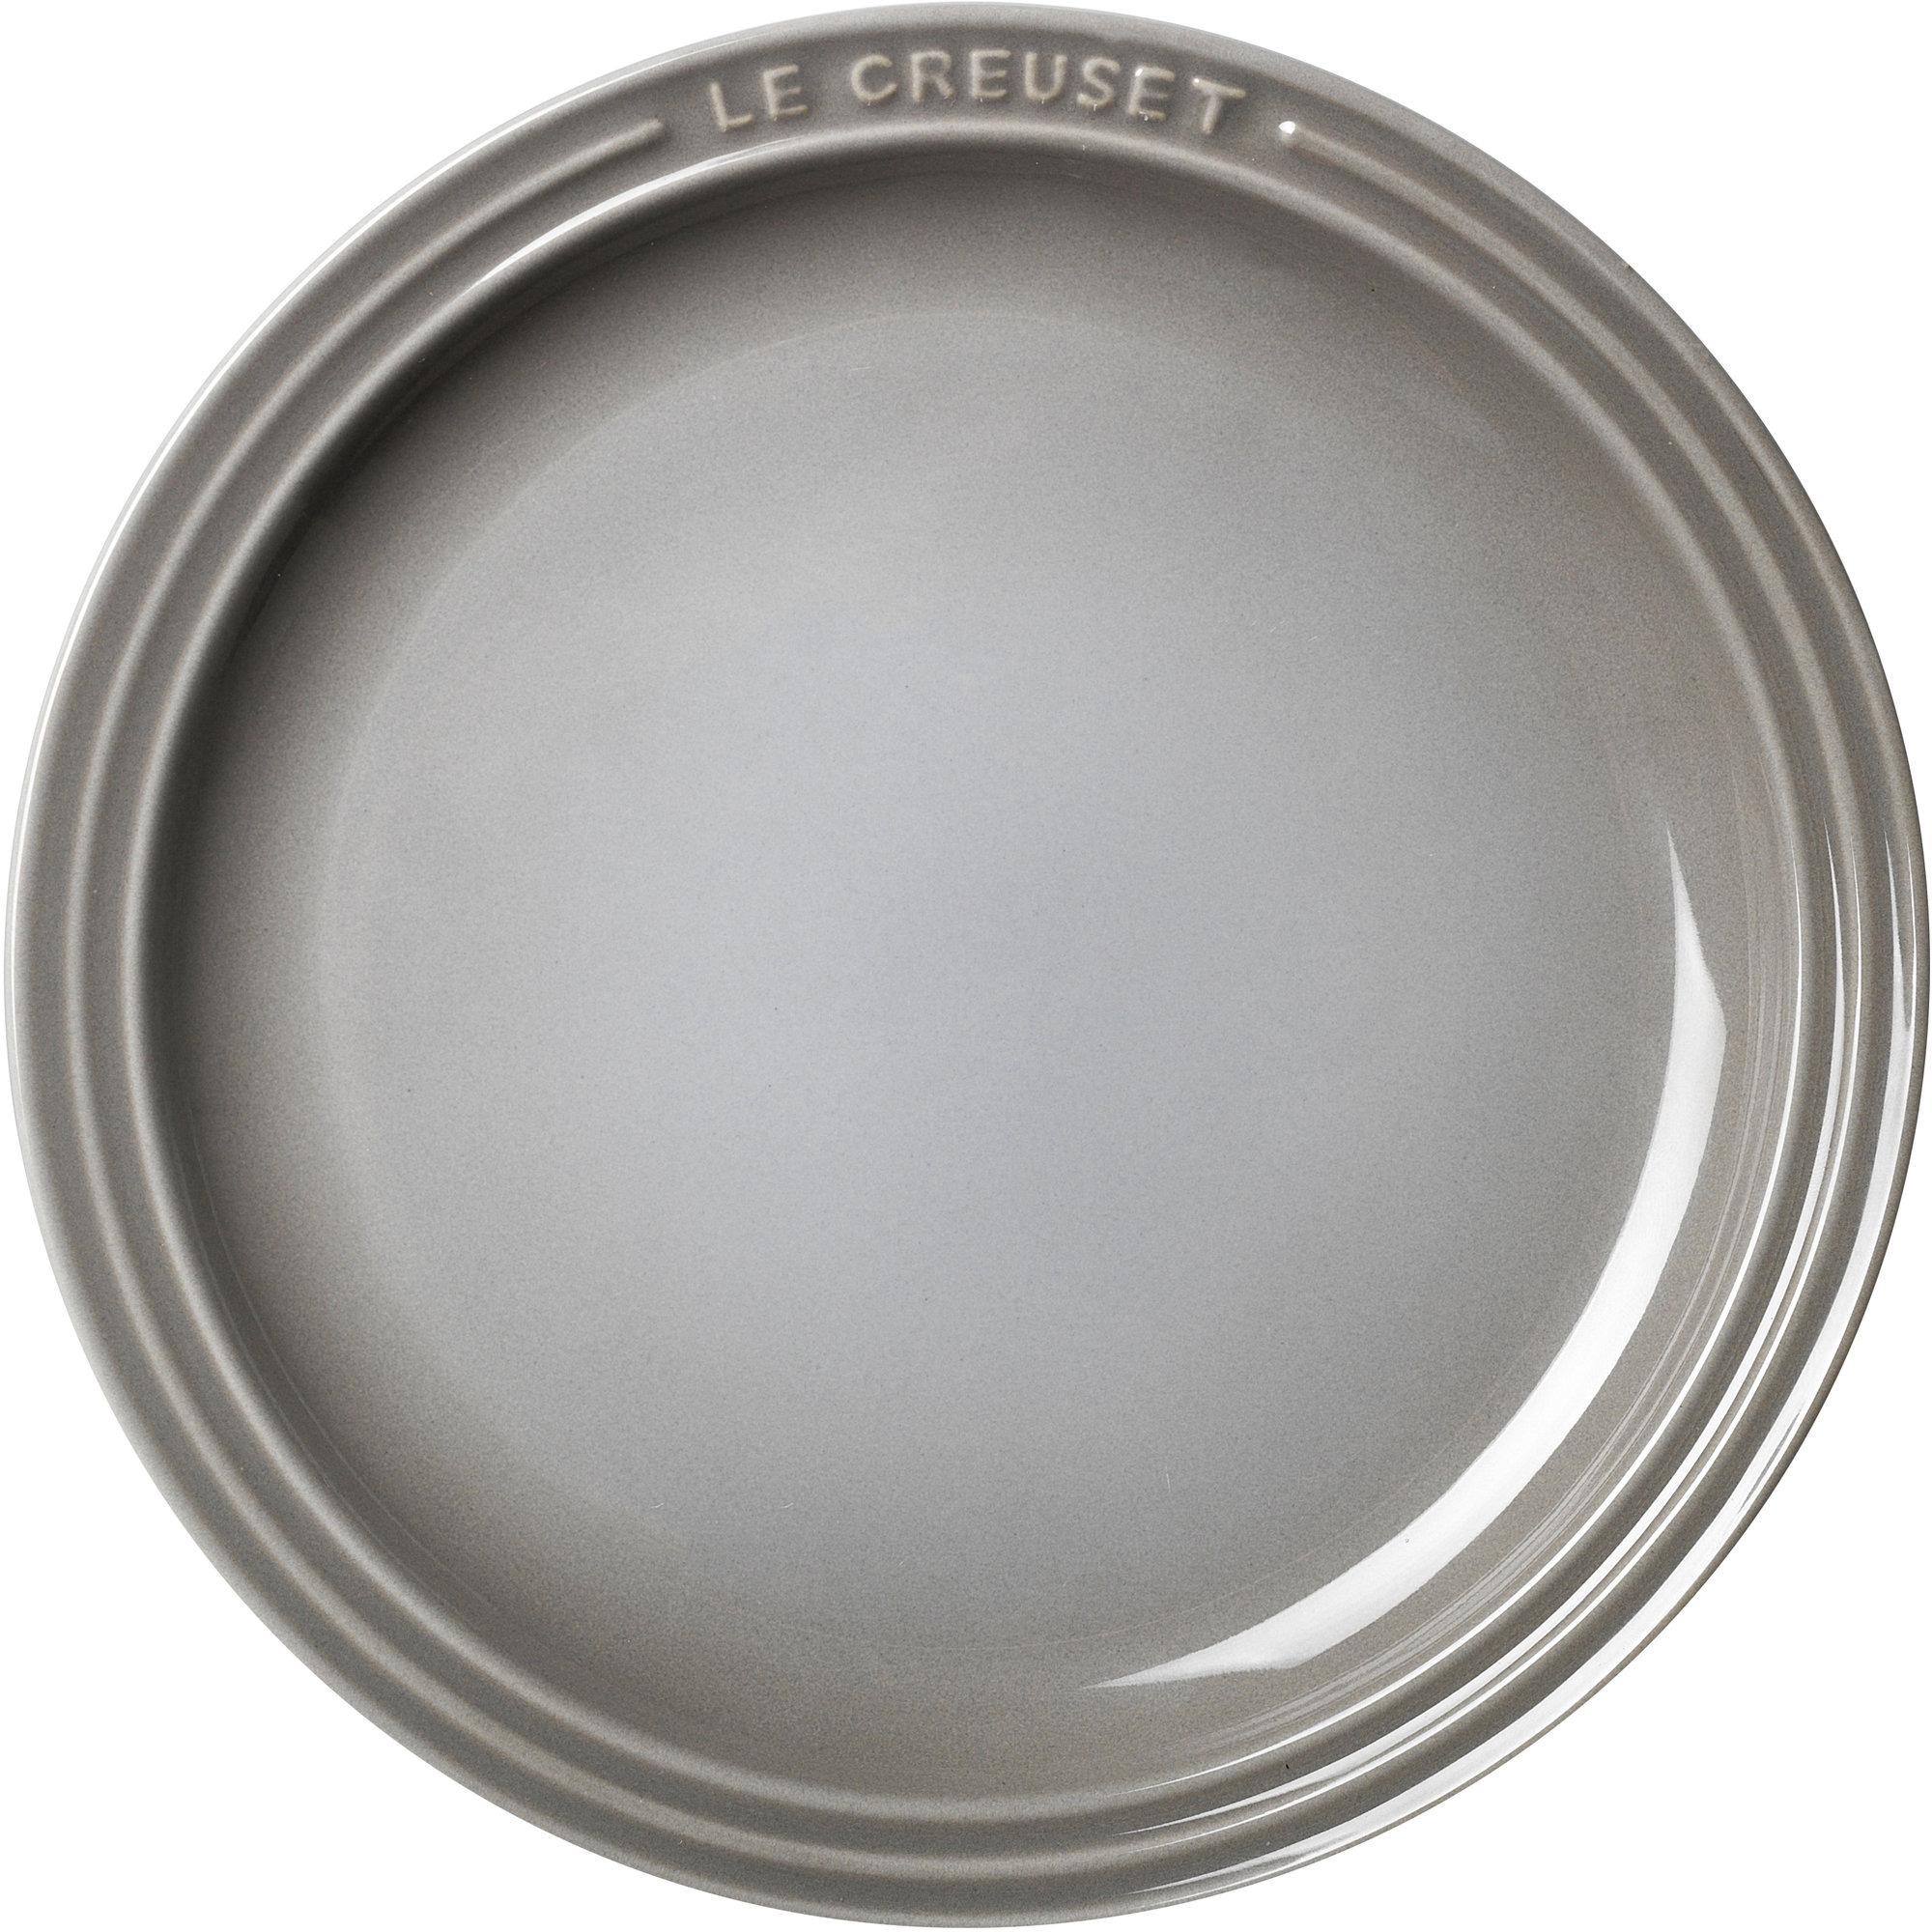 Le Creuset Frukosttallrik 23 cm Mist Gray